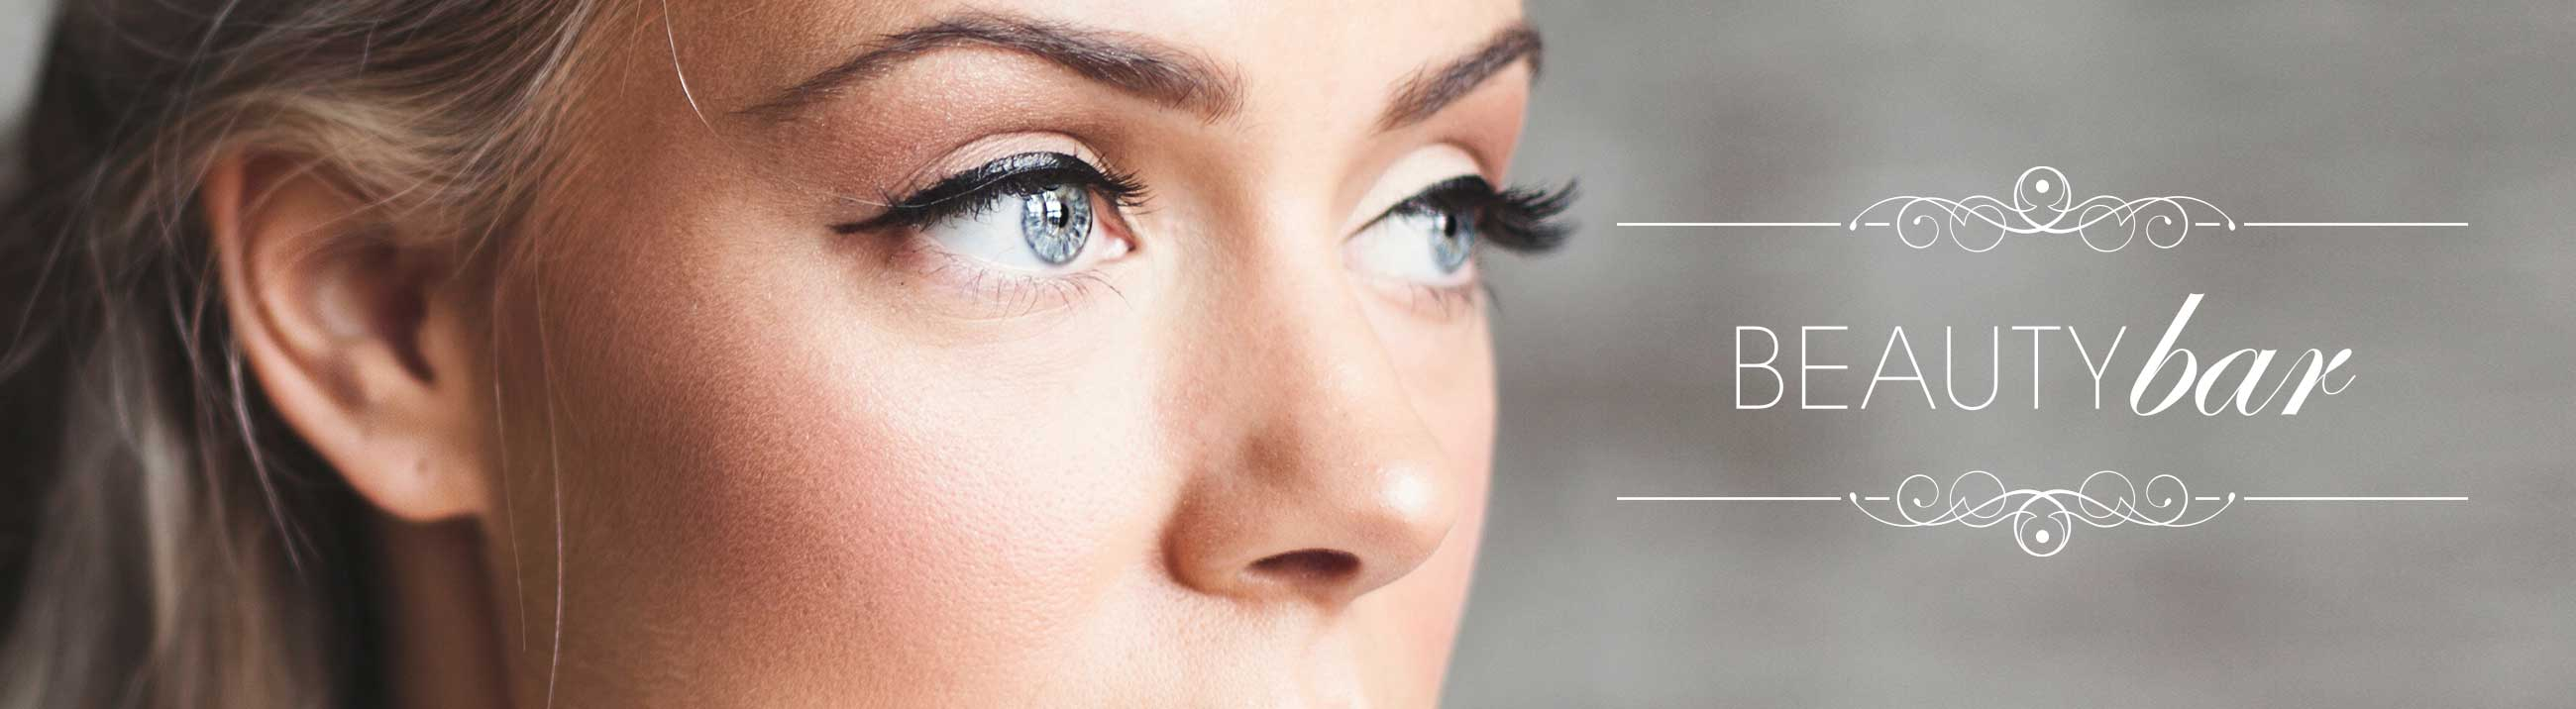 Eyelash extensions voila the best hair salon spa in - Voila institute of hair design kitchener ...